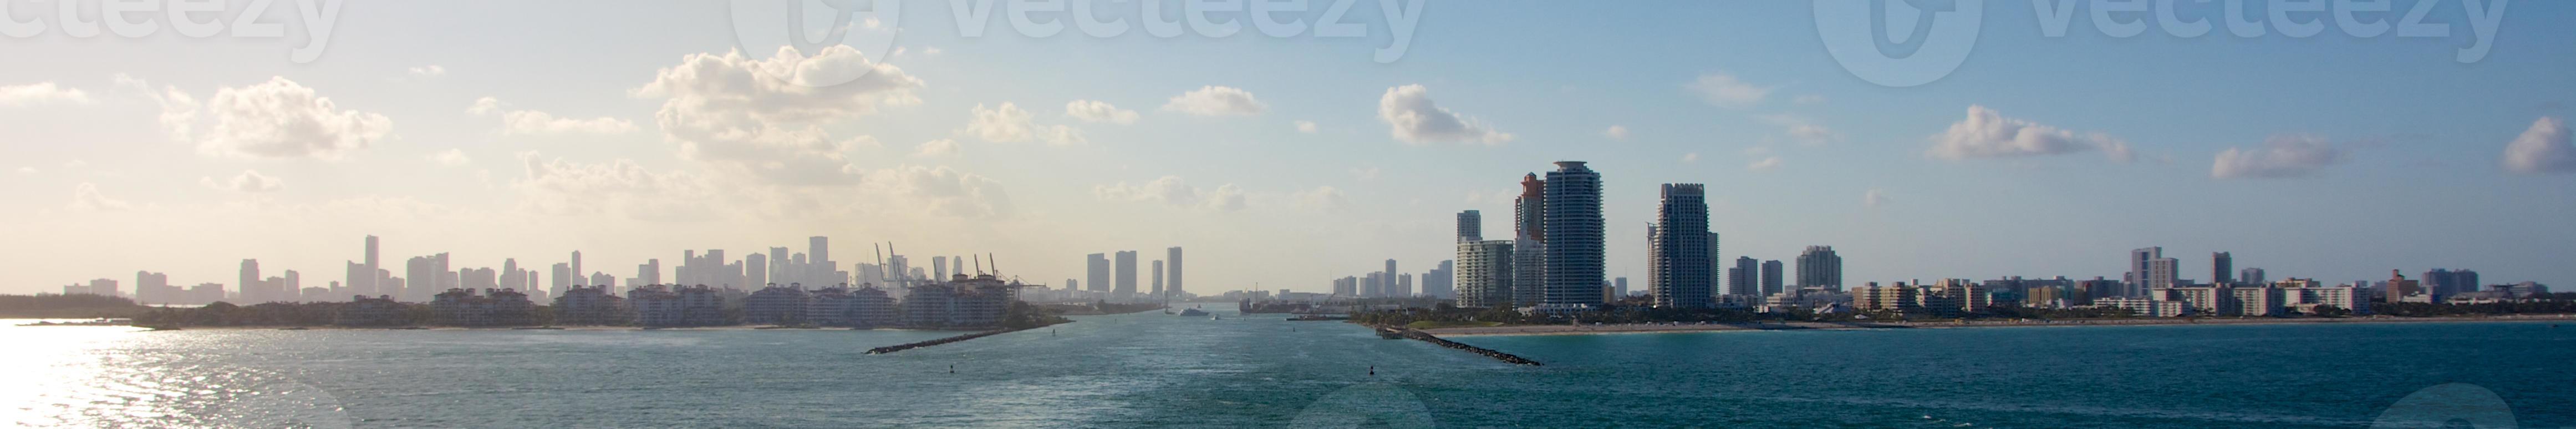 Miami Harbour Panorama foto